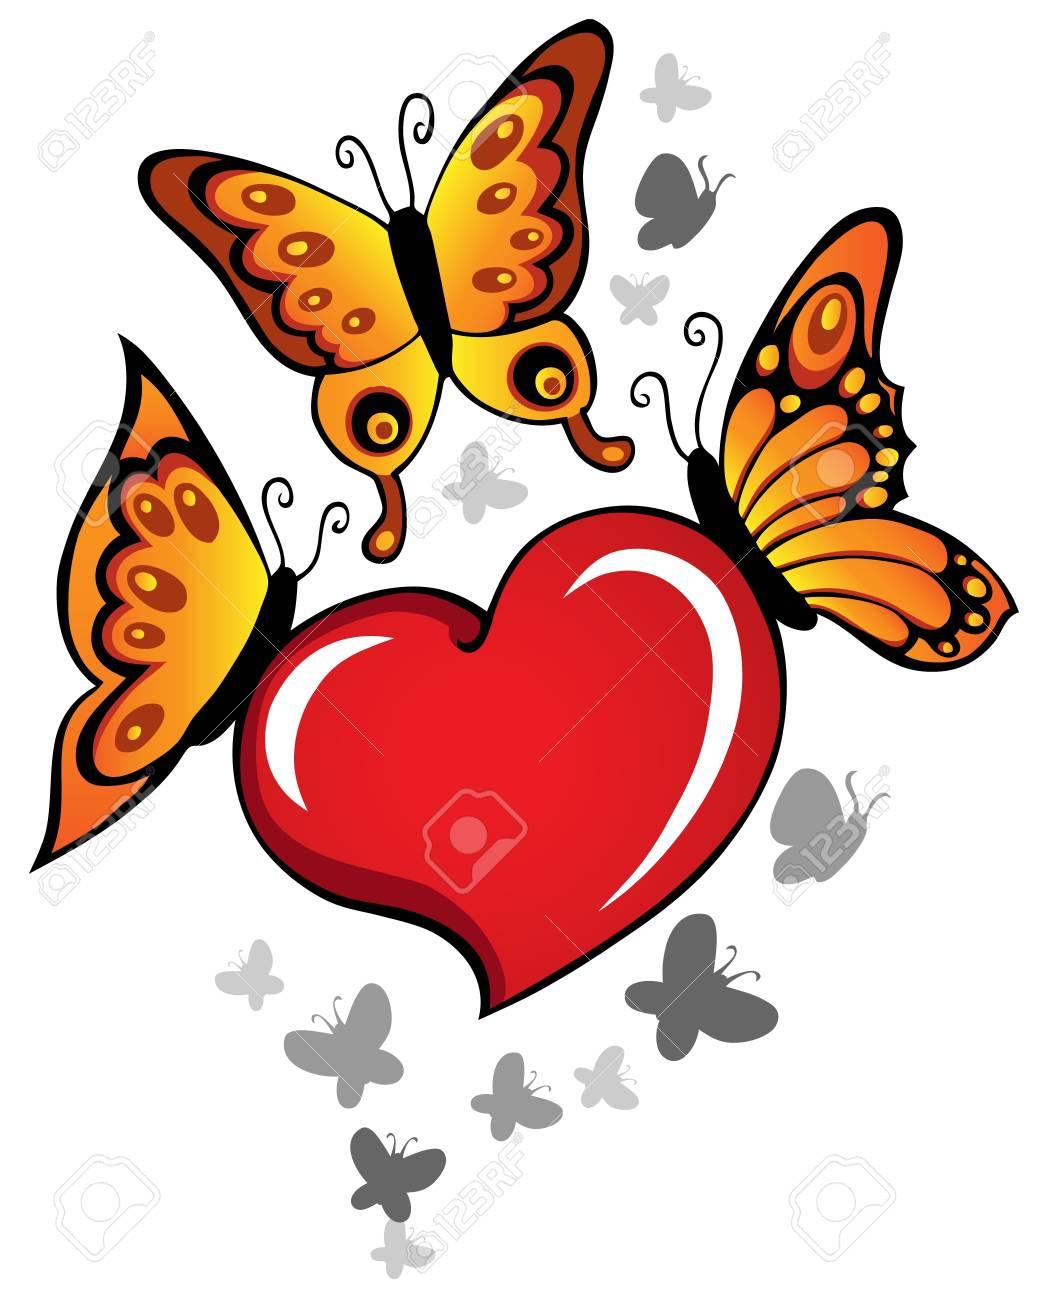 Heart theme image 6 - vector illustration. Stock Vector - 12165834